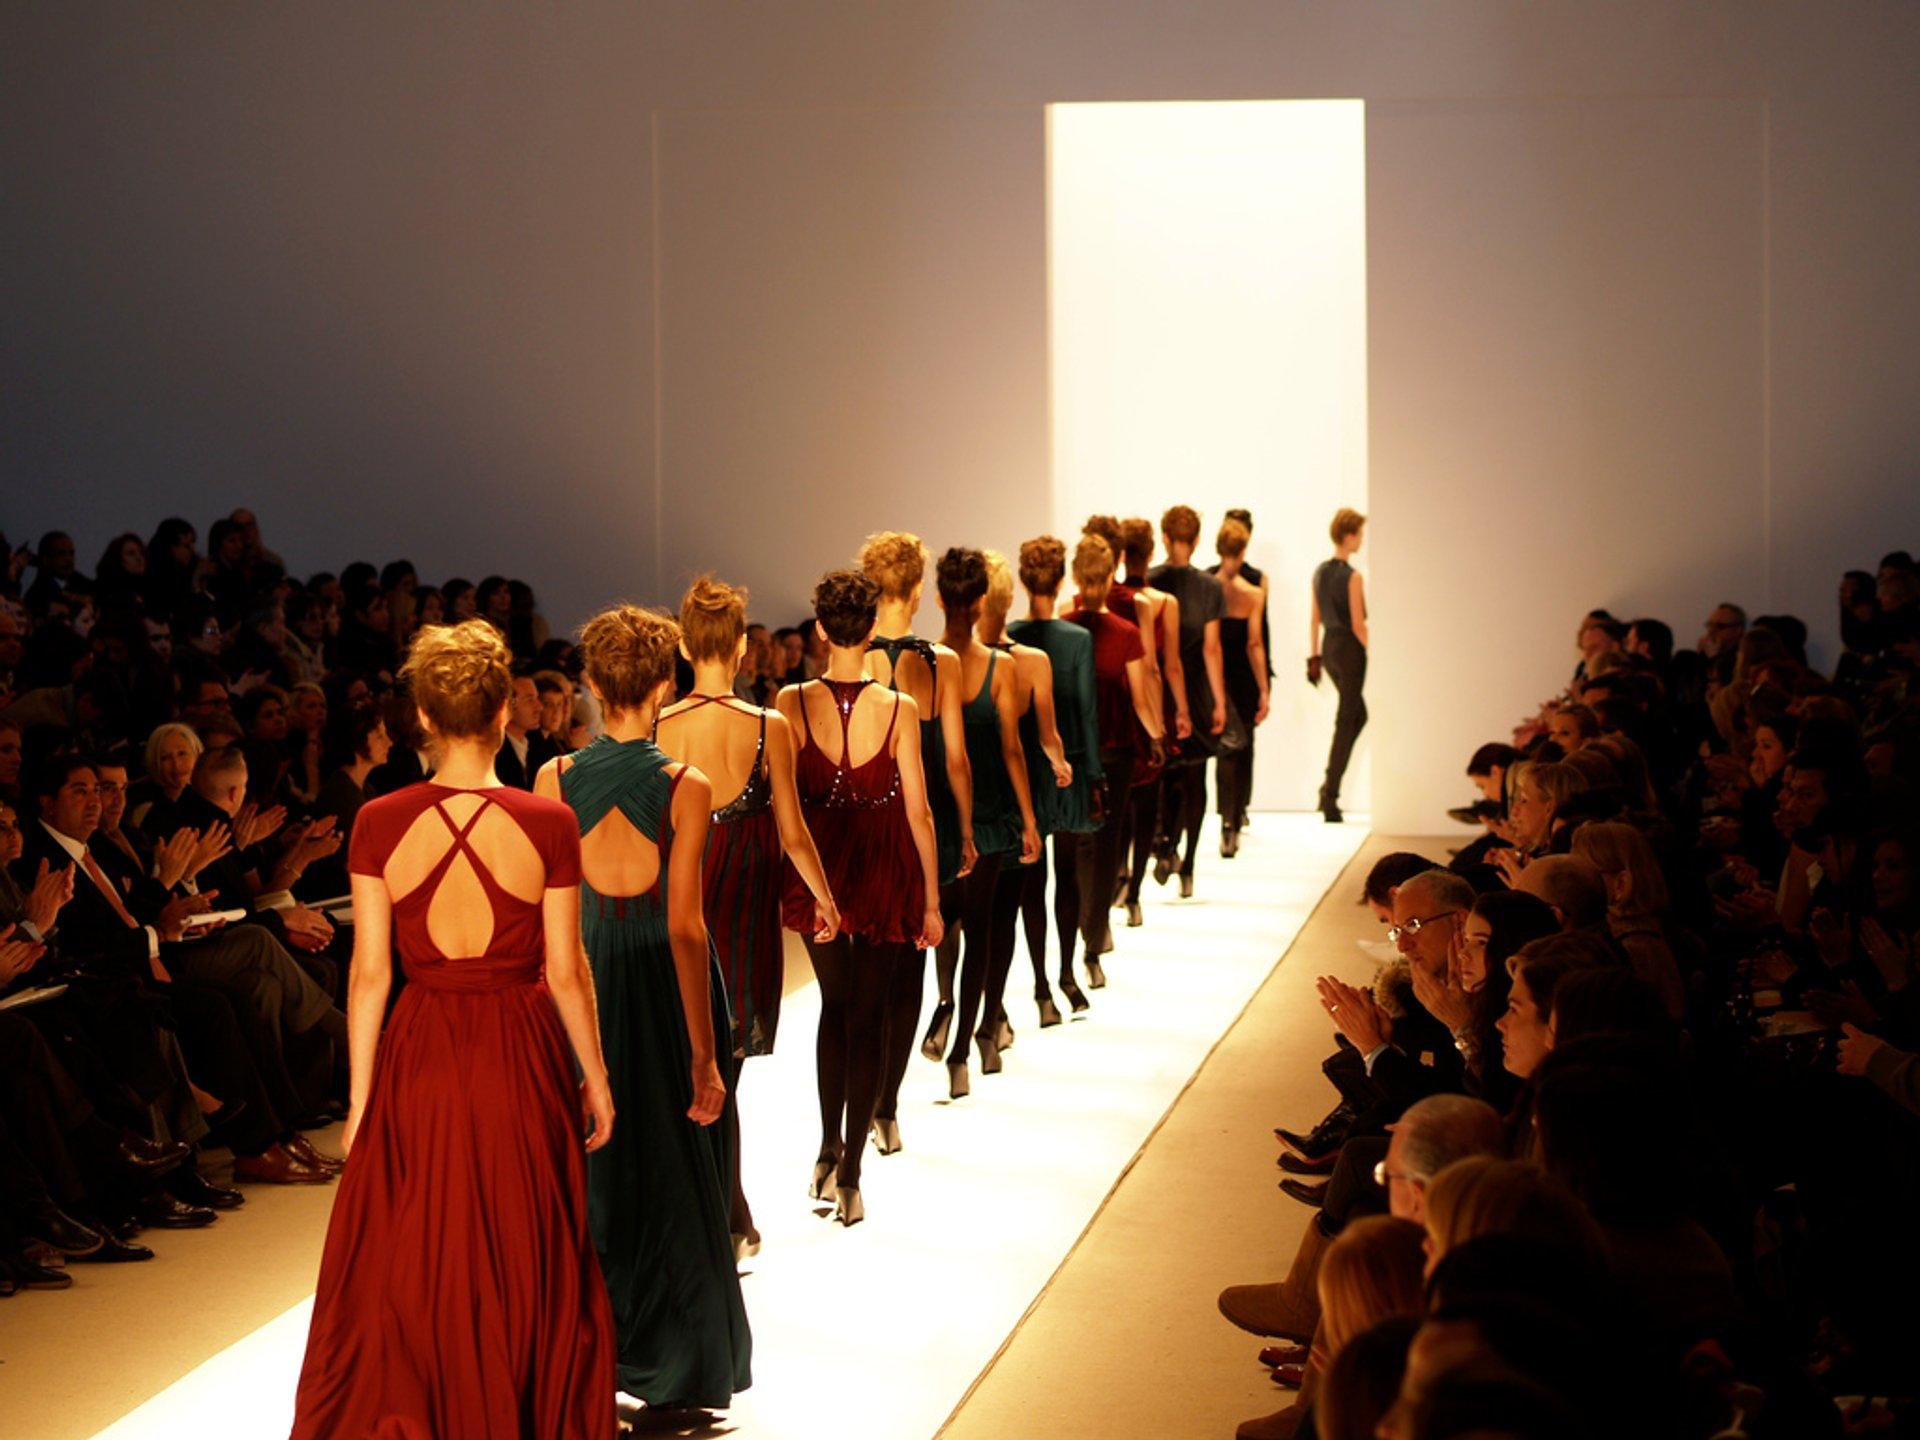 New York Fashion Week in New York - Best Season 2020